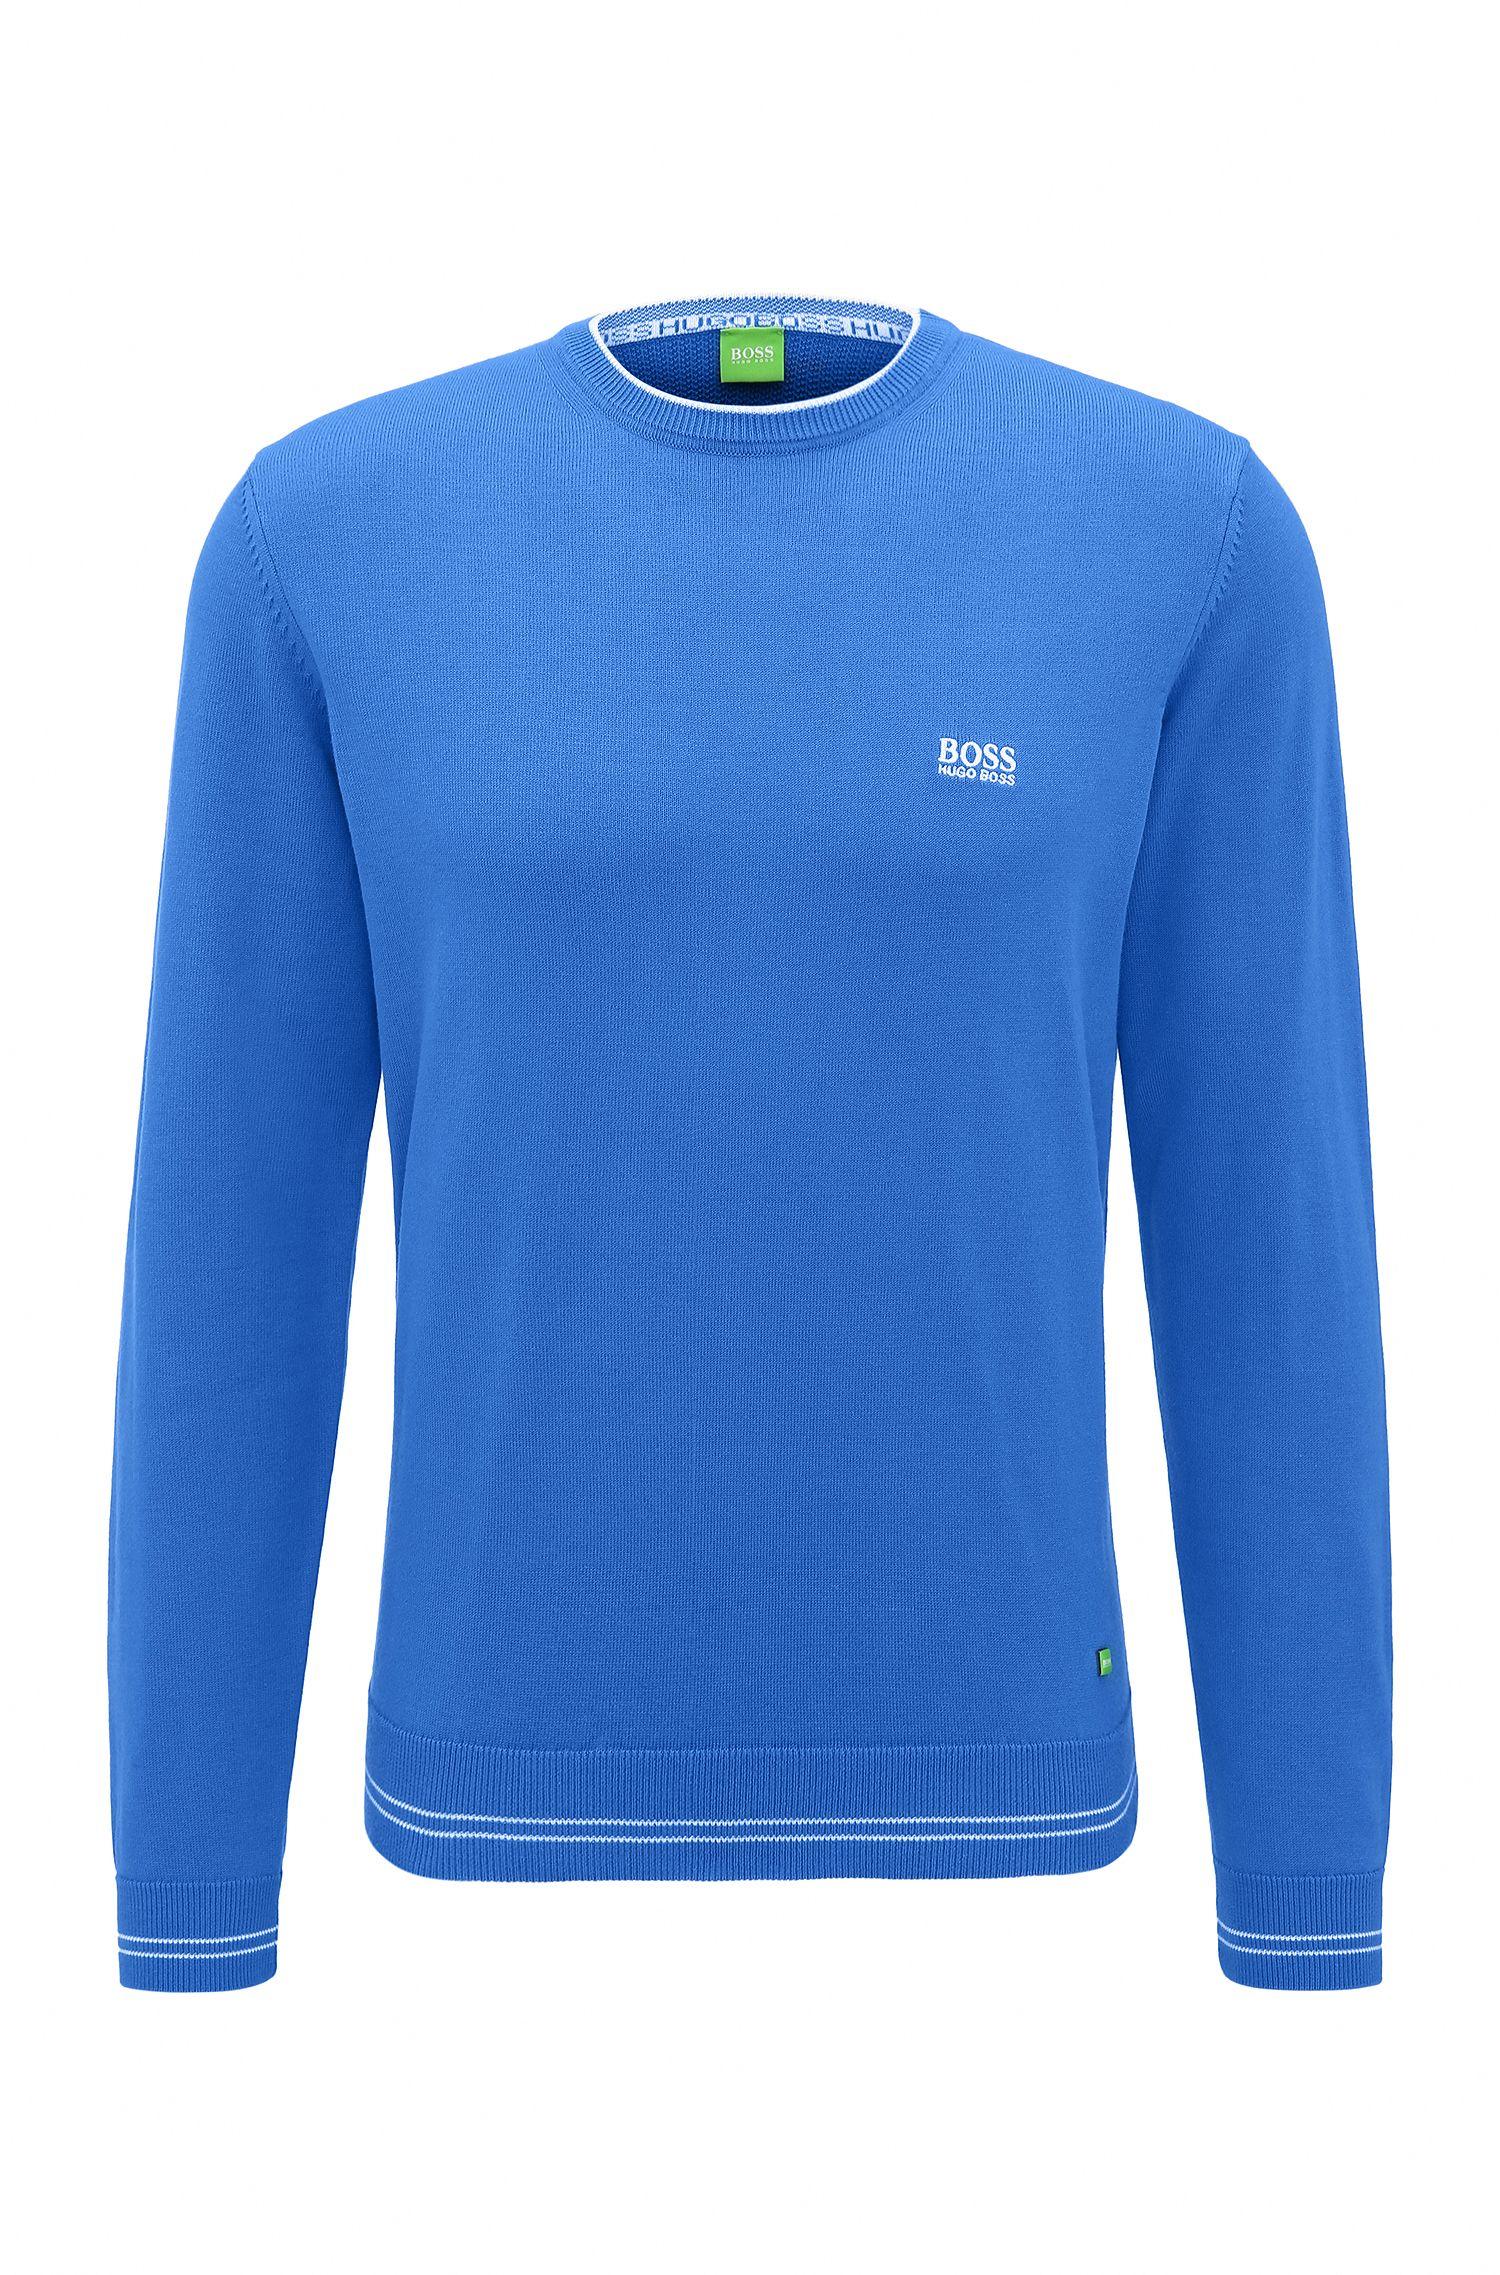 'Rime' | Regular Fit, Cotton Blend Sweater